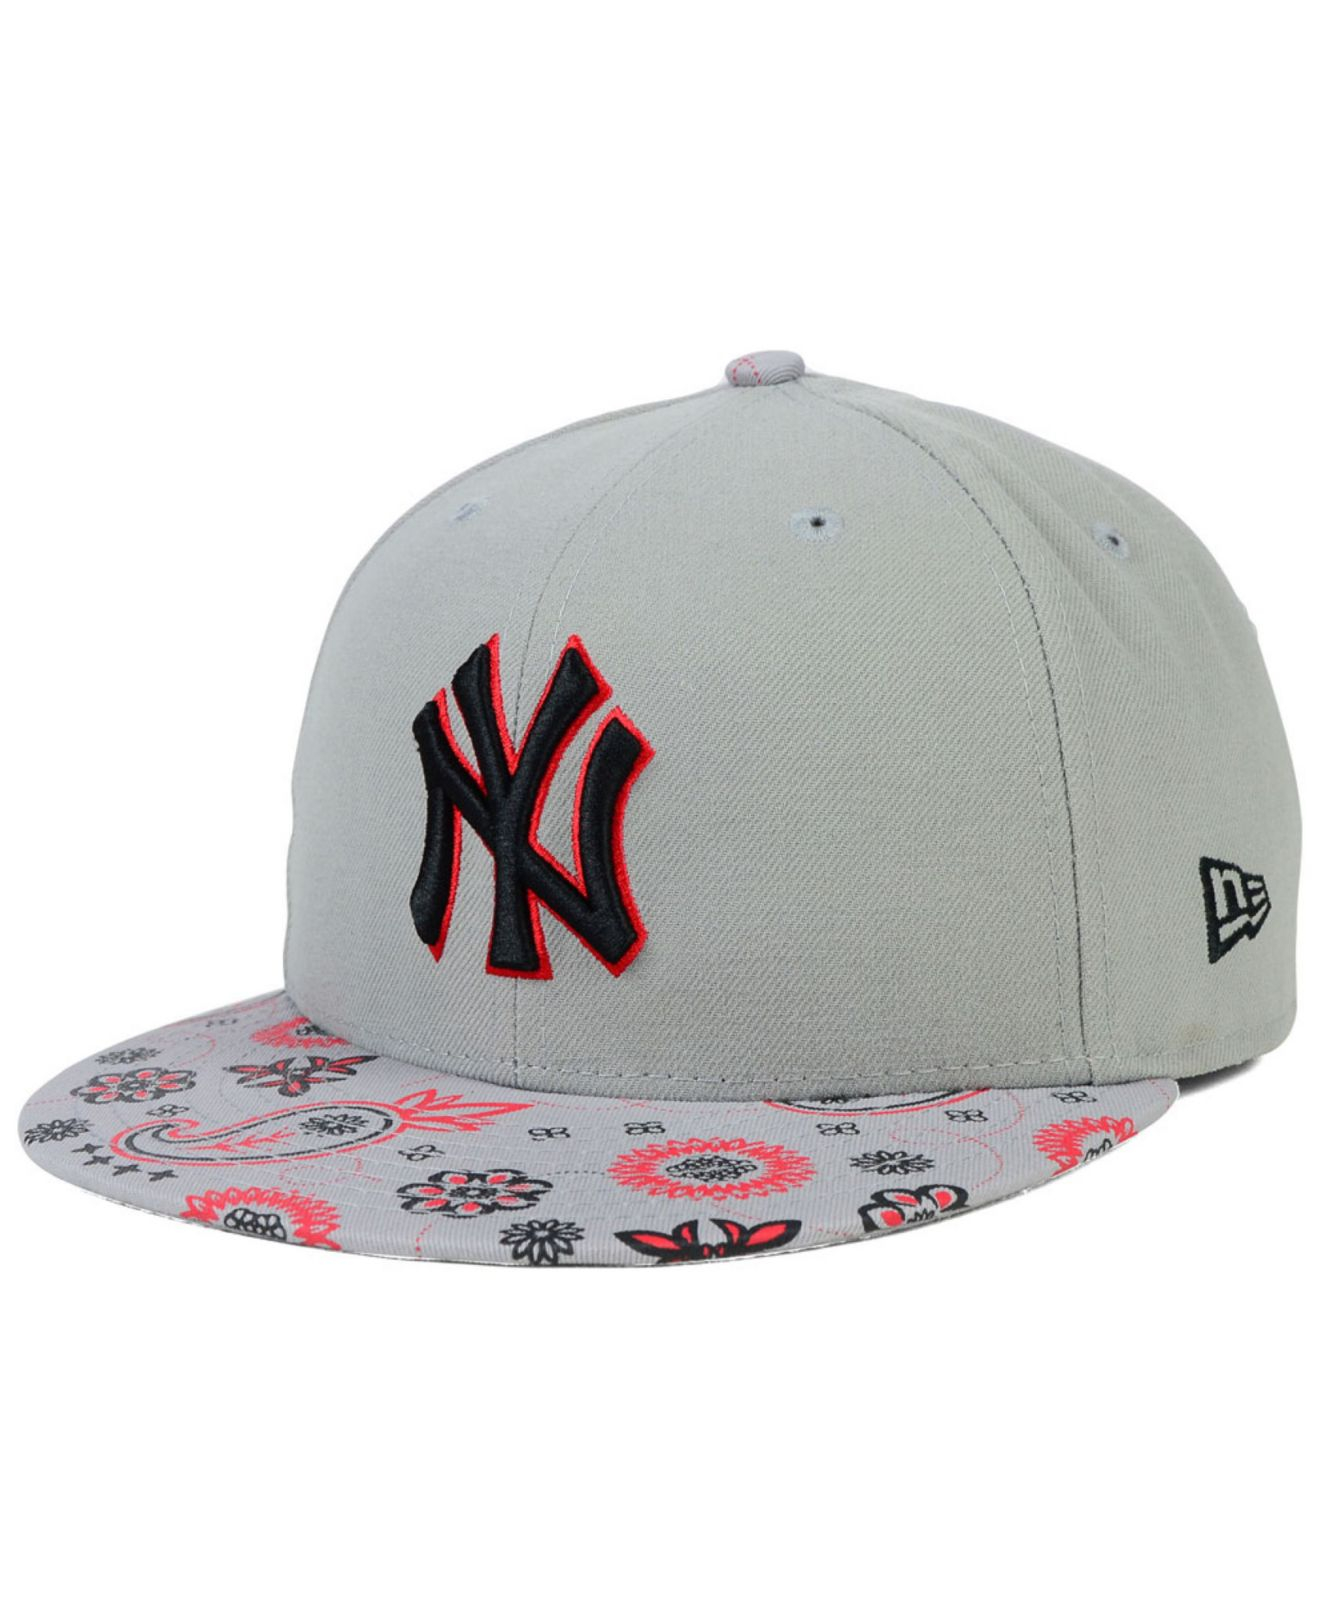 4f7e548d0ba ... australia lyst ktz new york yankees paisley time 59fifty cap in blue  for men e5746 5fd06 ...